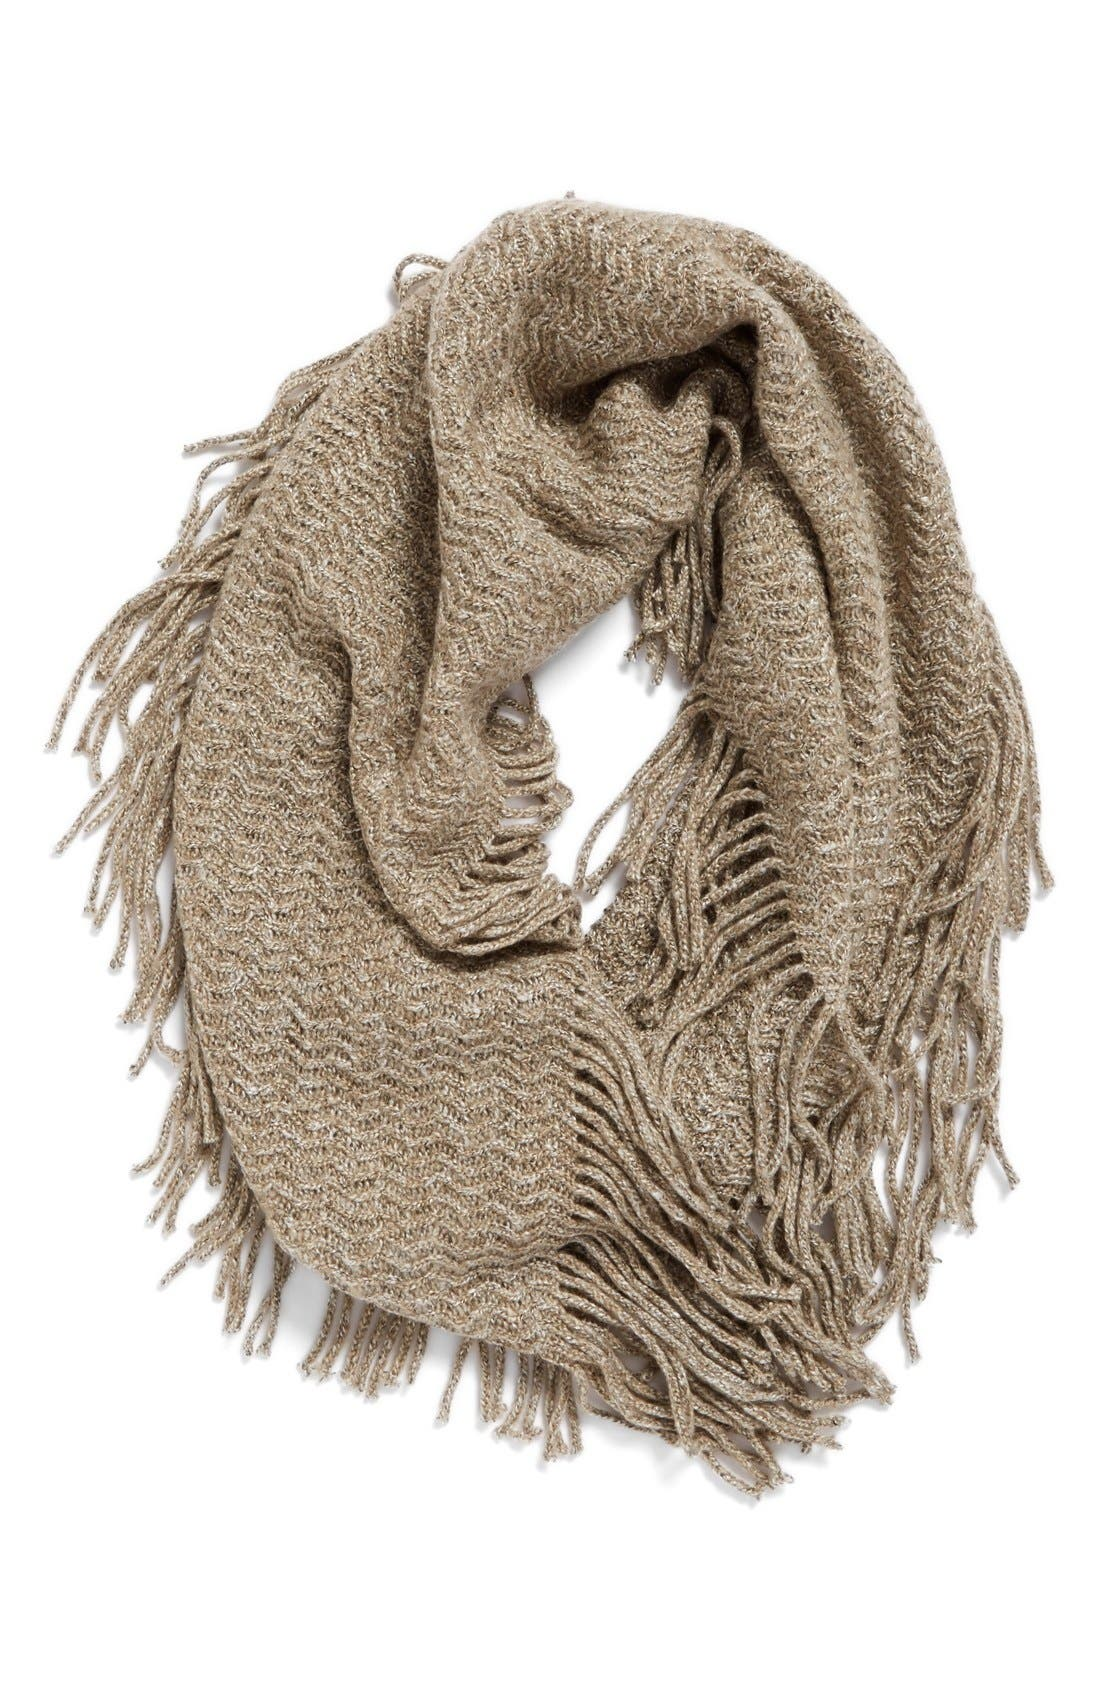 Alternate Image 1 Selected - BP. Marled Knit Fringe Infinity Scarf